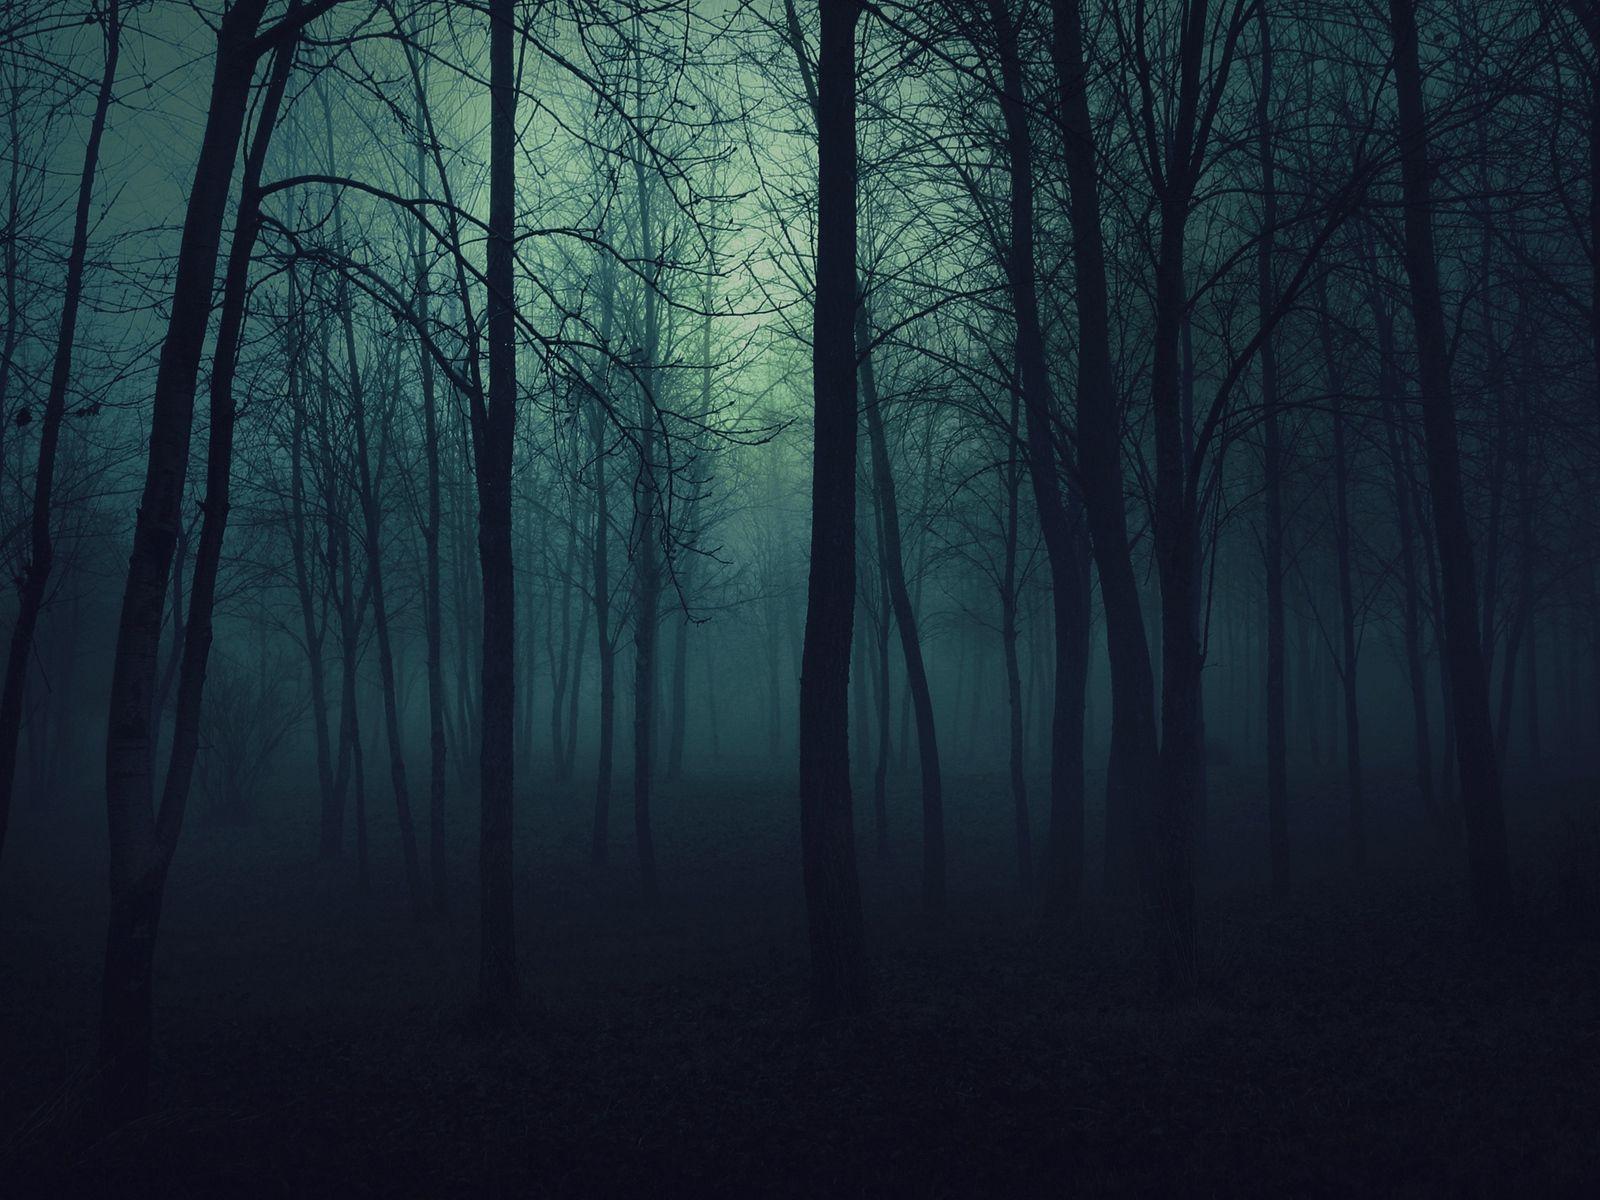 Download Wallpaper 1600x1200 Wood Trees Gloomy Fog Haze Darkness Standard 4 3 Hd Background Dark Wood Background Forest Wallpaper Scary Backgrounds